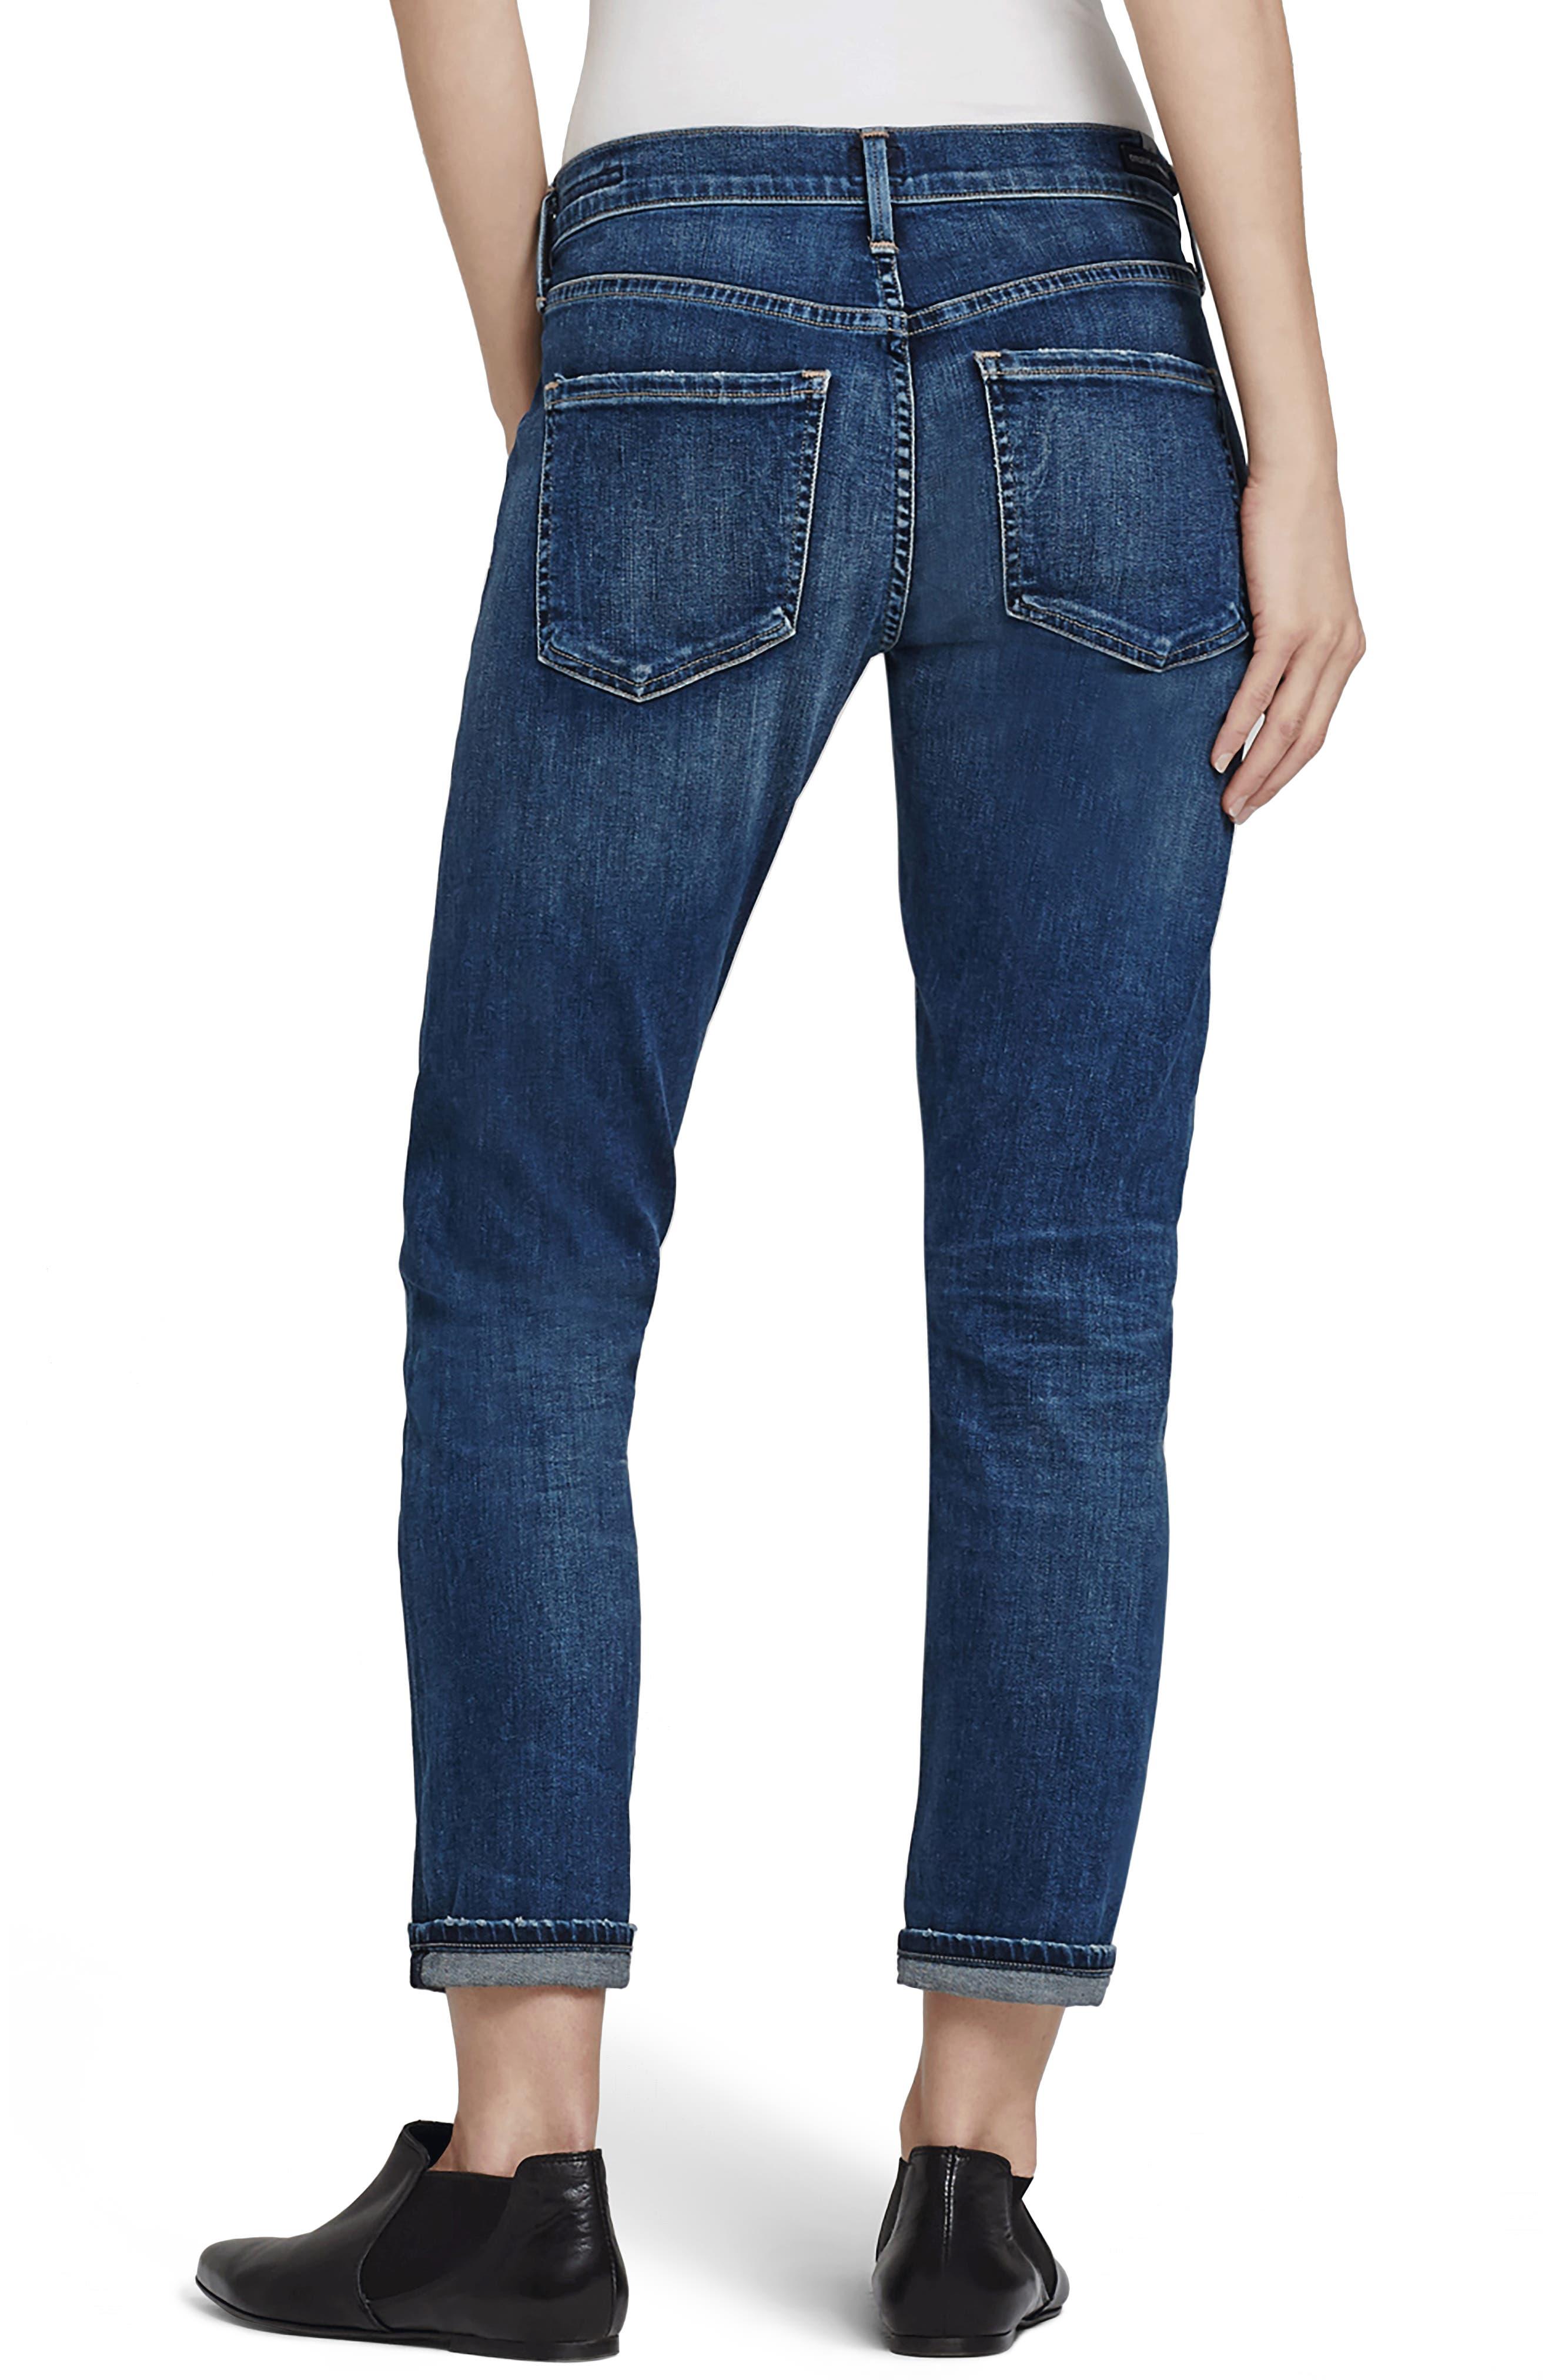 Alternate Image 2  - Citizens of Humanity Emerson Slim Boyfriend Jeans (Modern Love)